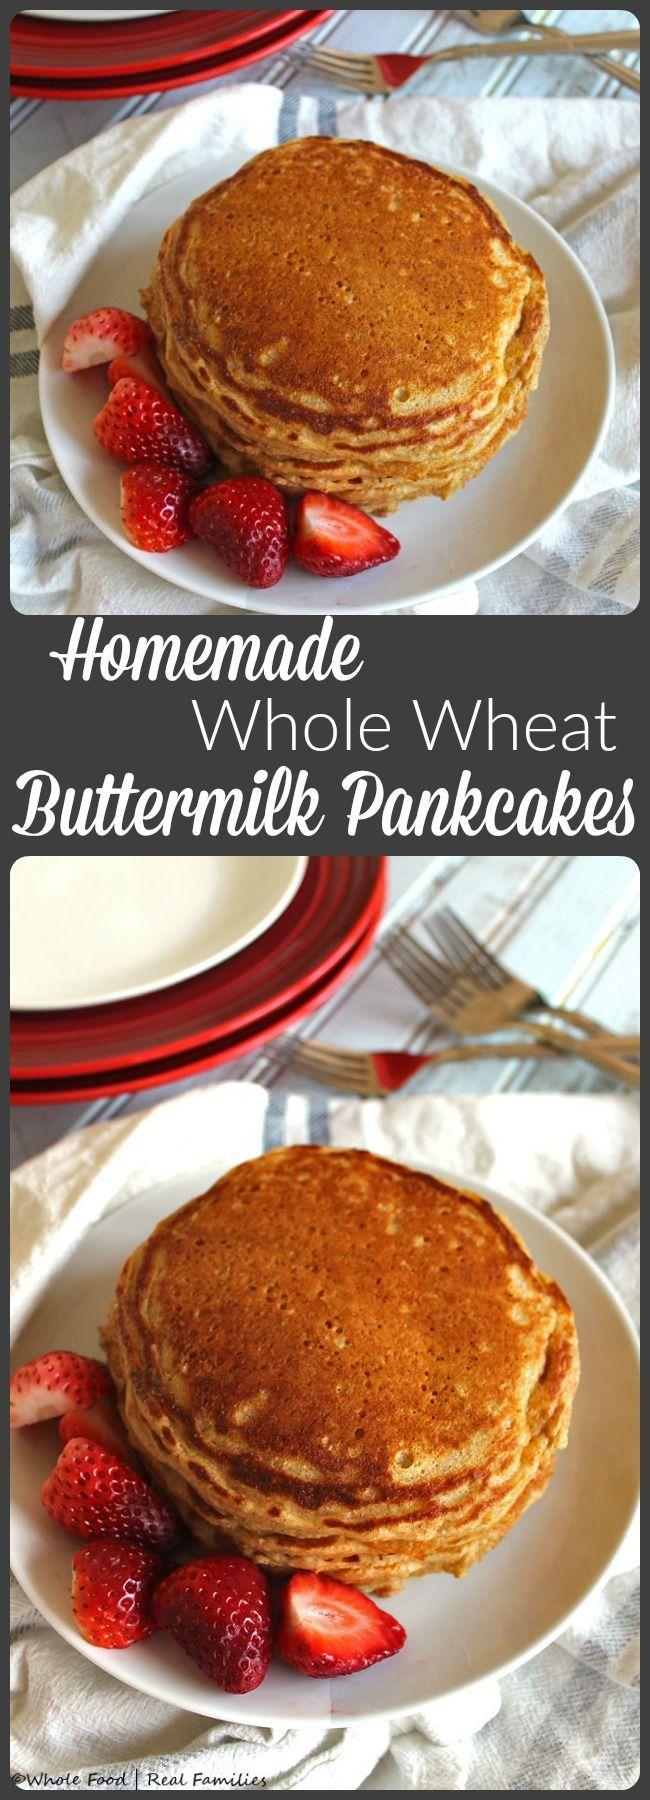 17 Best ideas about Whole Wheat Pancakes on Pinterest ...